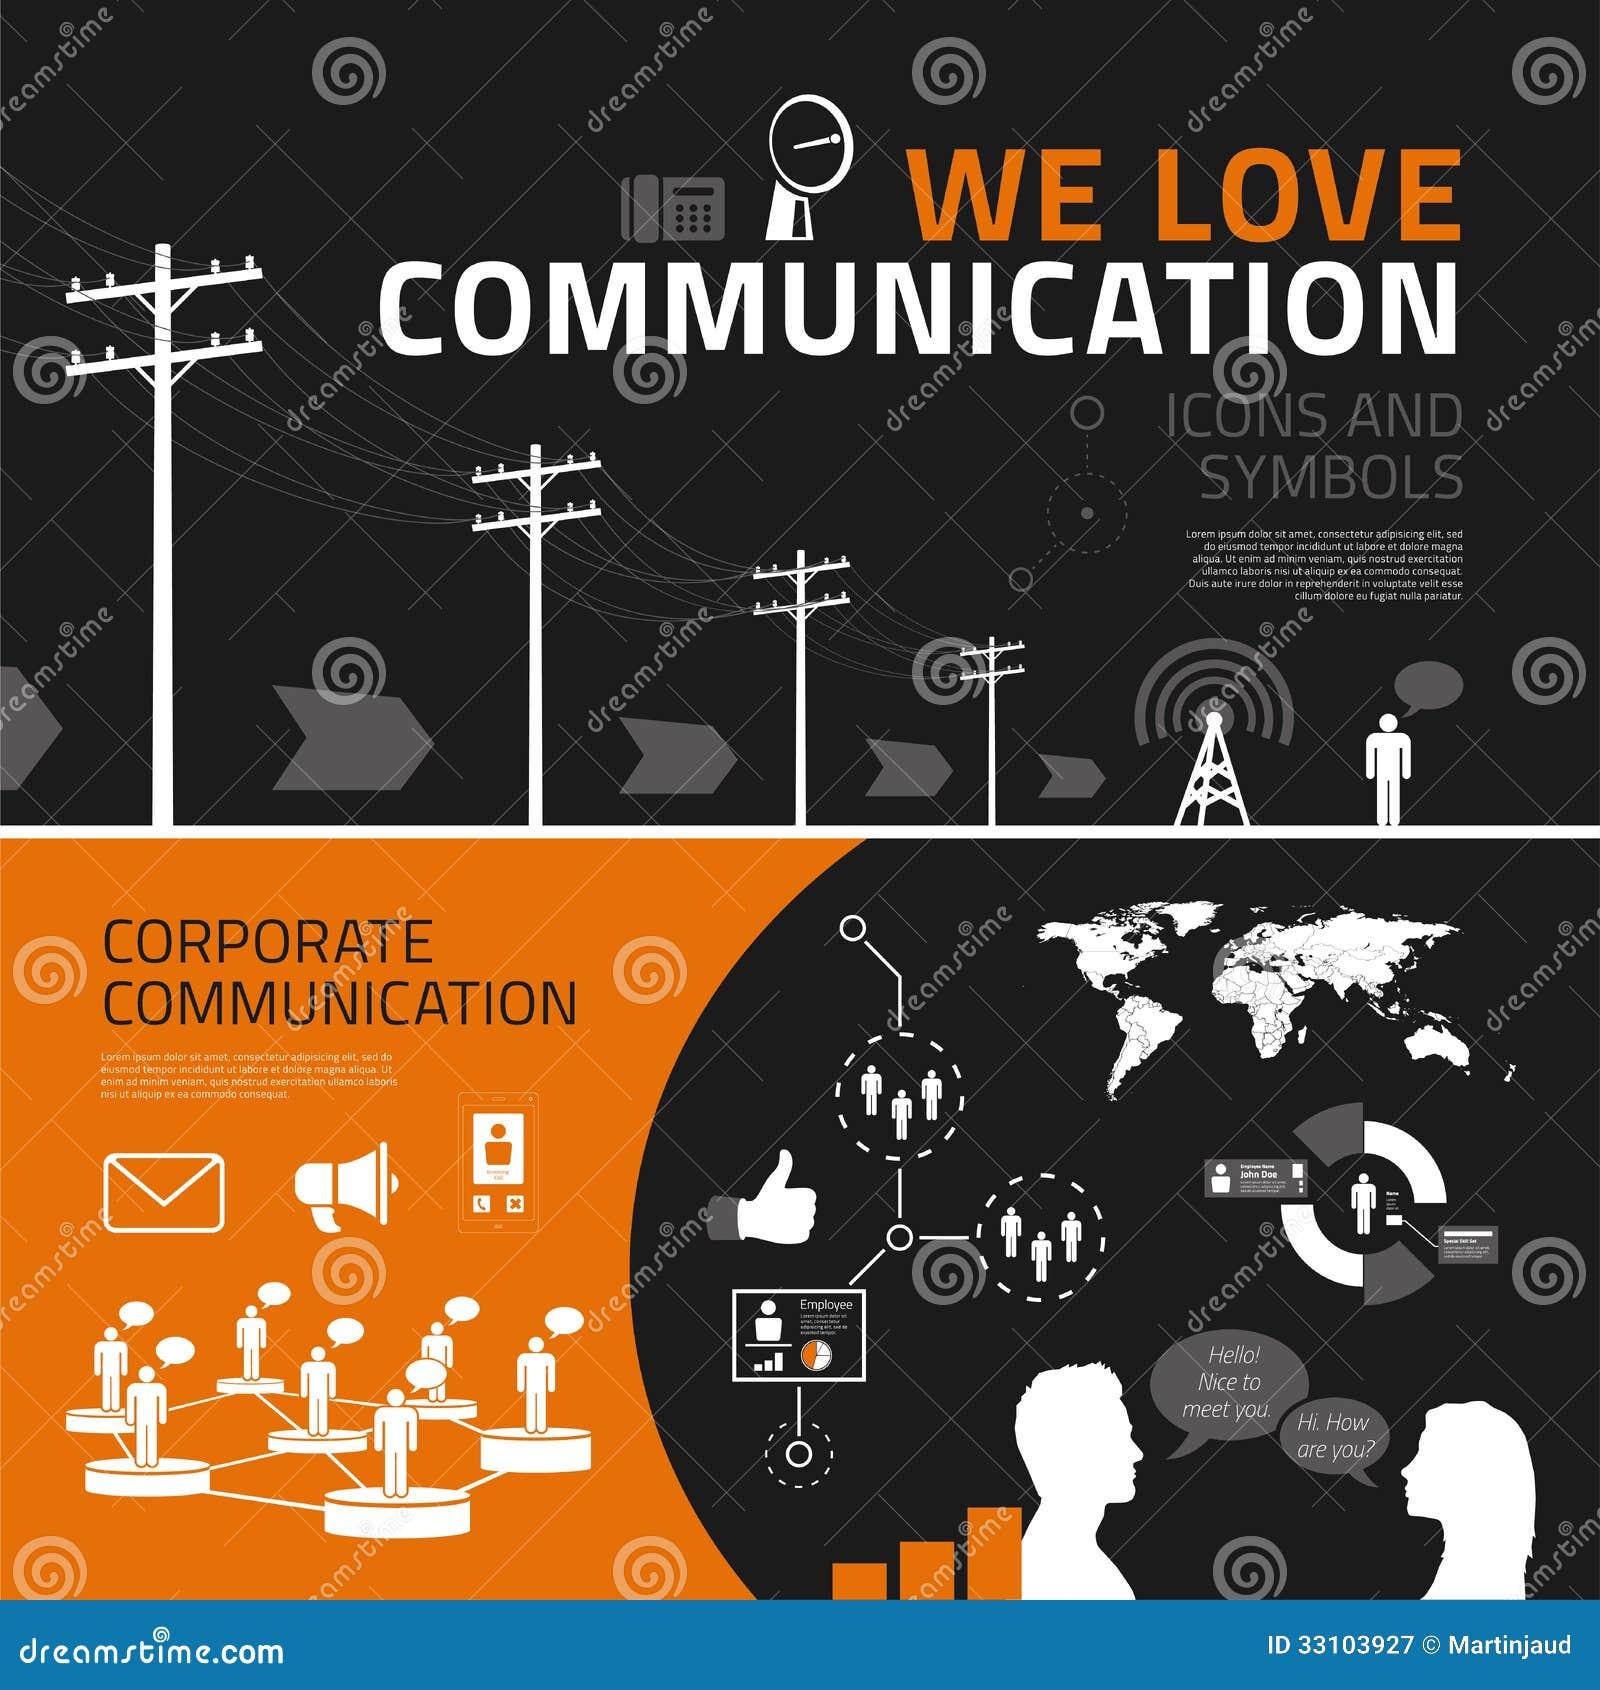 通信infographics元素、象和标志